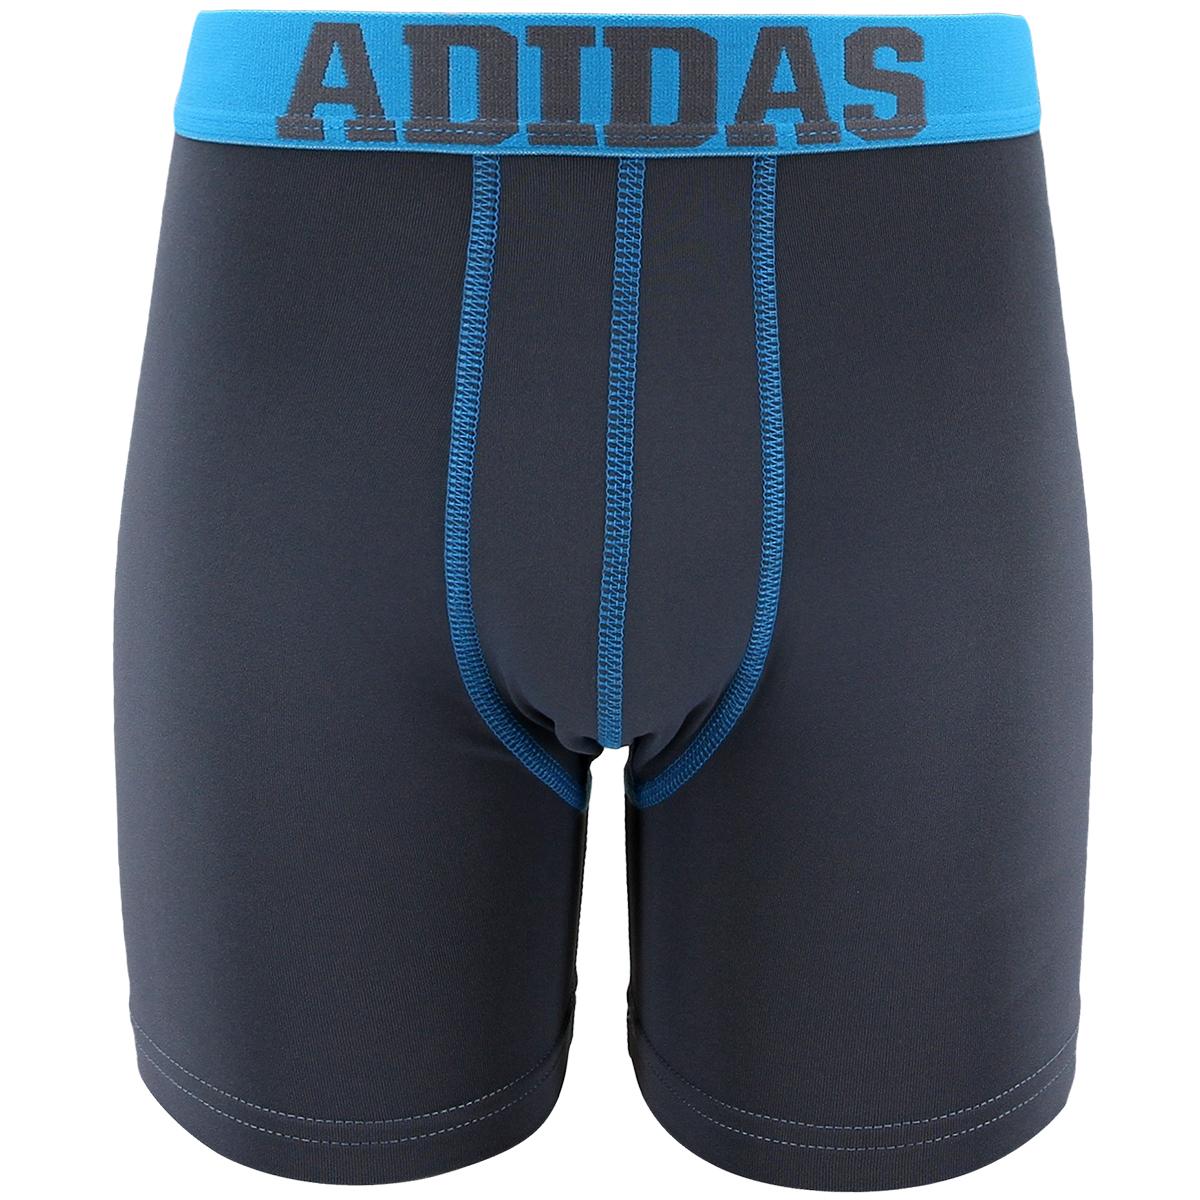 Adidas Big Boys' Climalite Boxer Briefs, 2-Pack - Black, XL